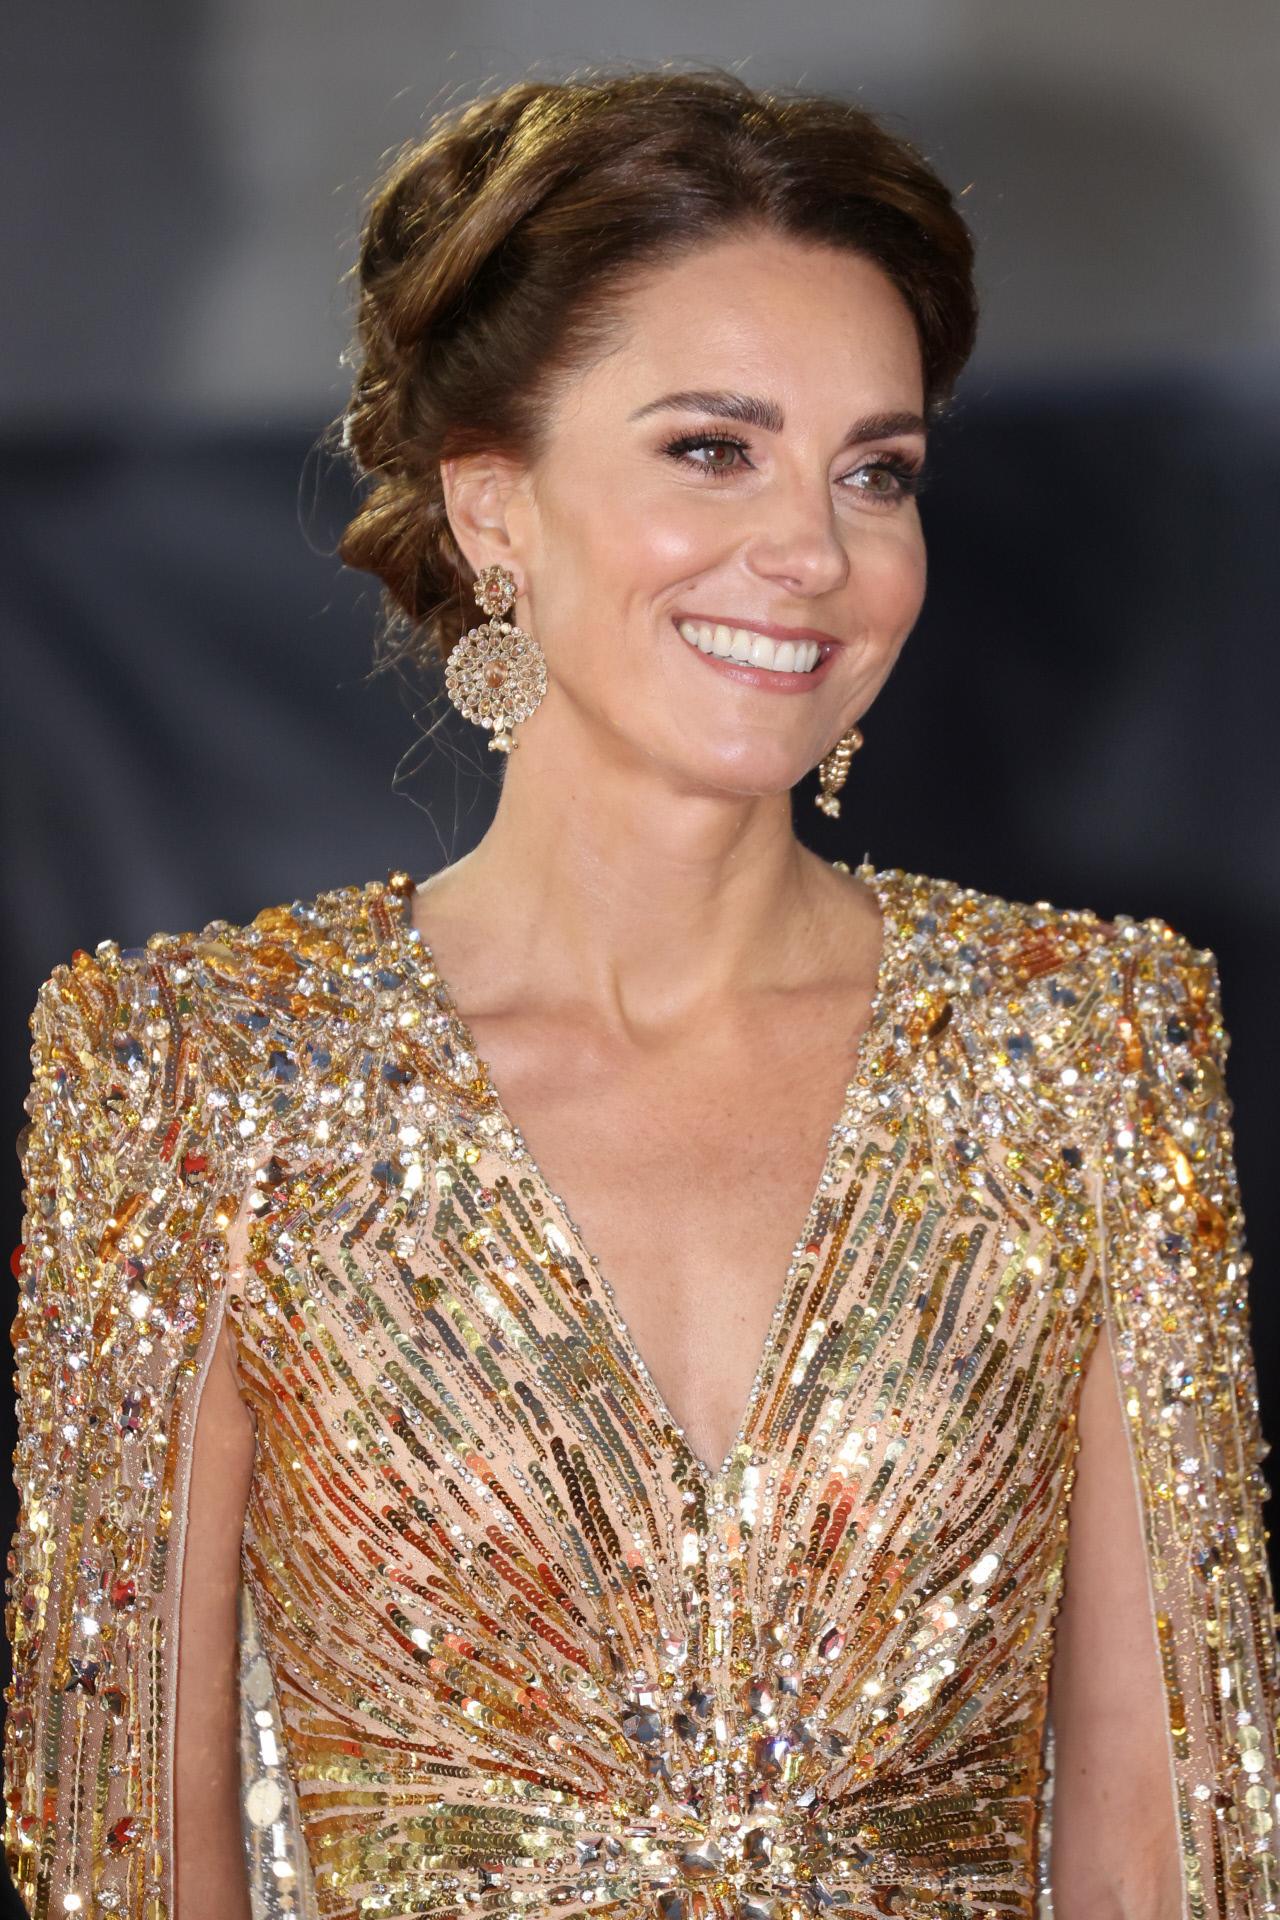 Con un maquillaje muy natural que realzaba su mirada, Kate Middleton eligió un recogido para peinarse.